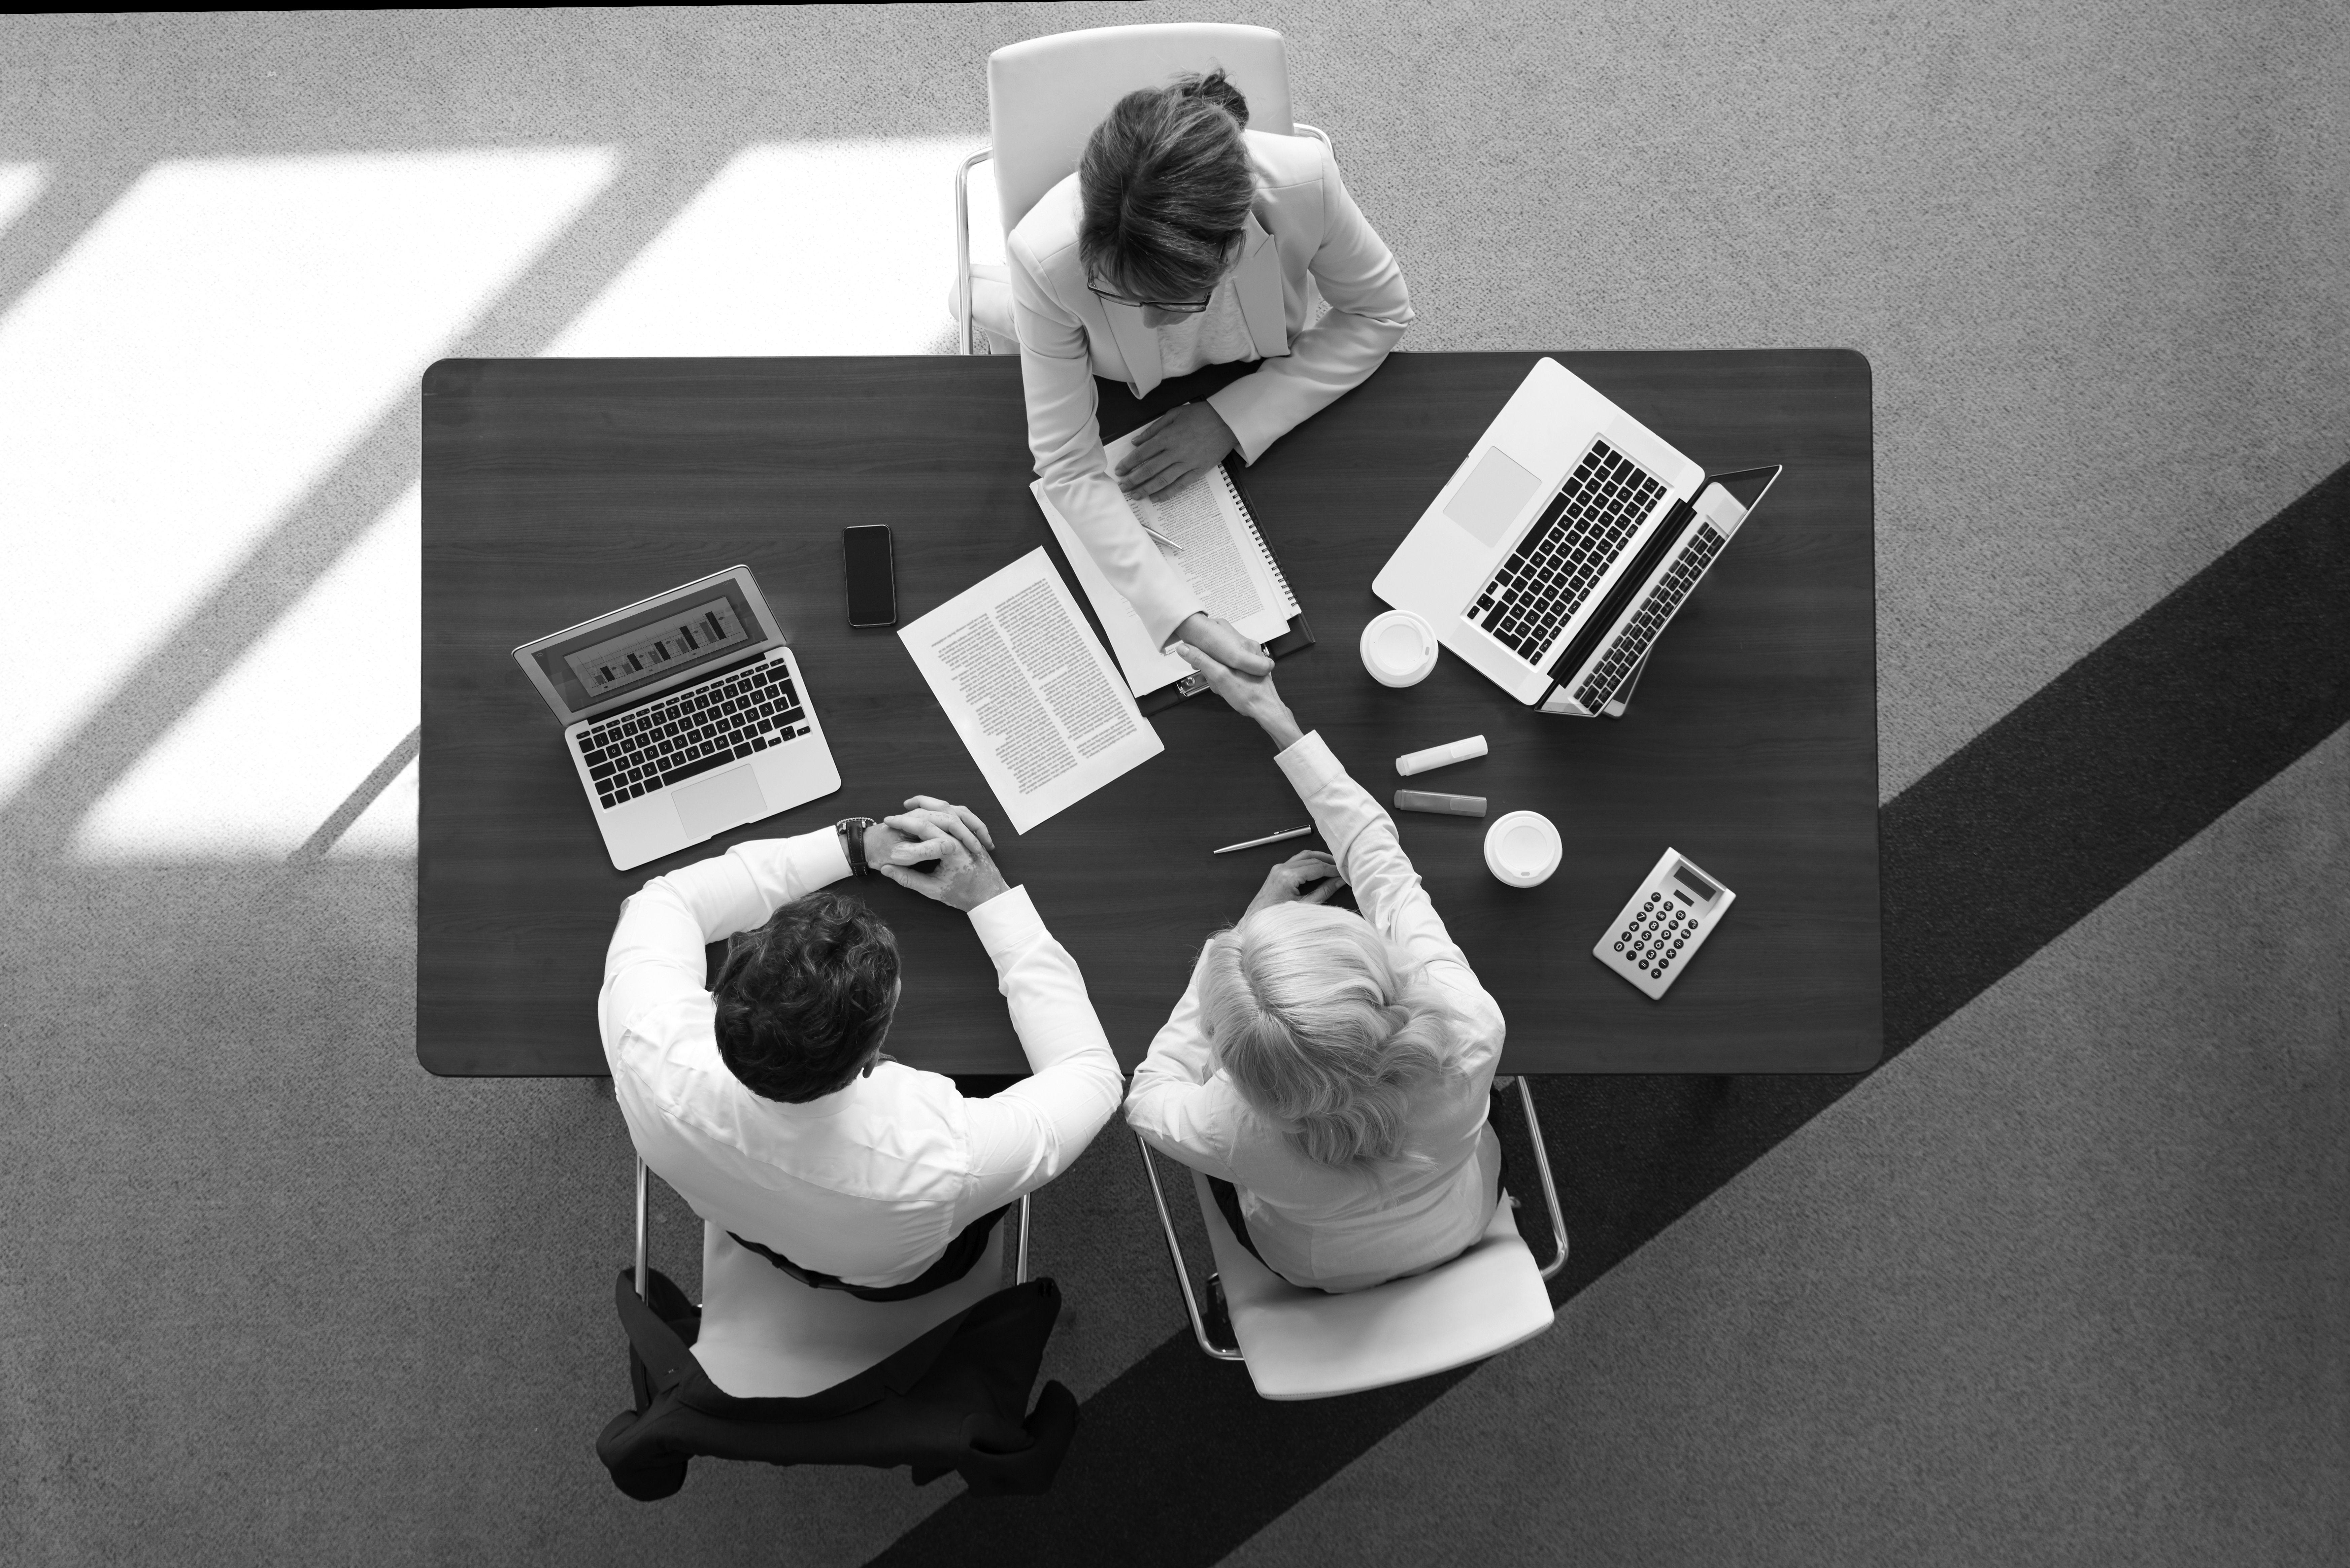 people talking at desk in office